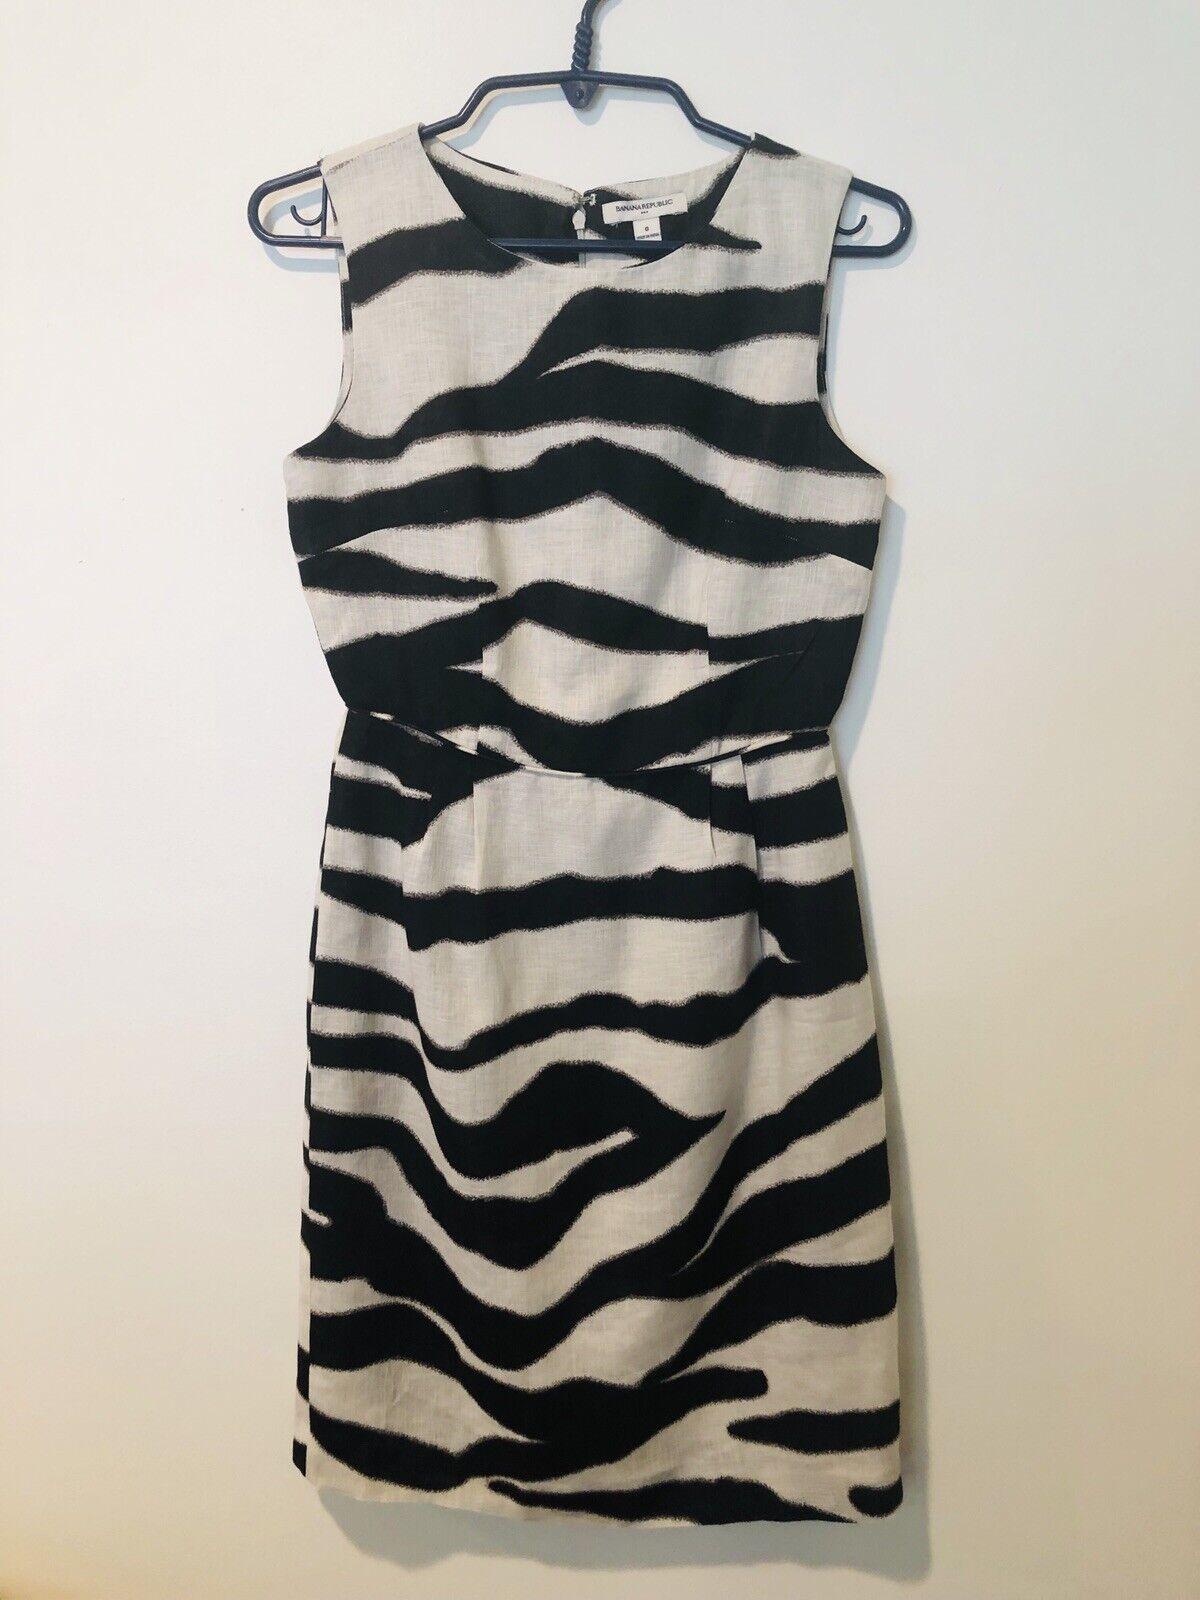 Banana Republic Sleeveless Fully Lined Linen Round Neck Lightweight Dress Size 0